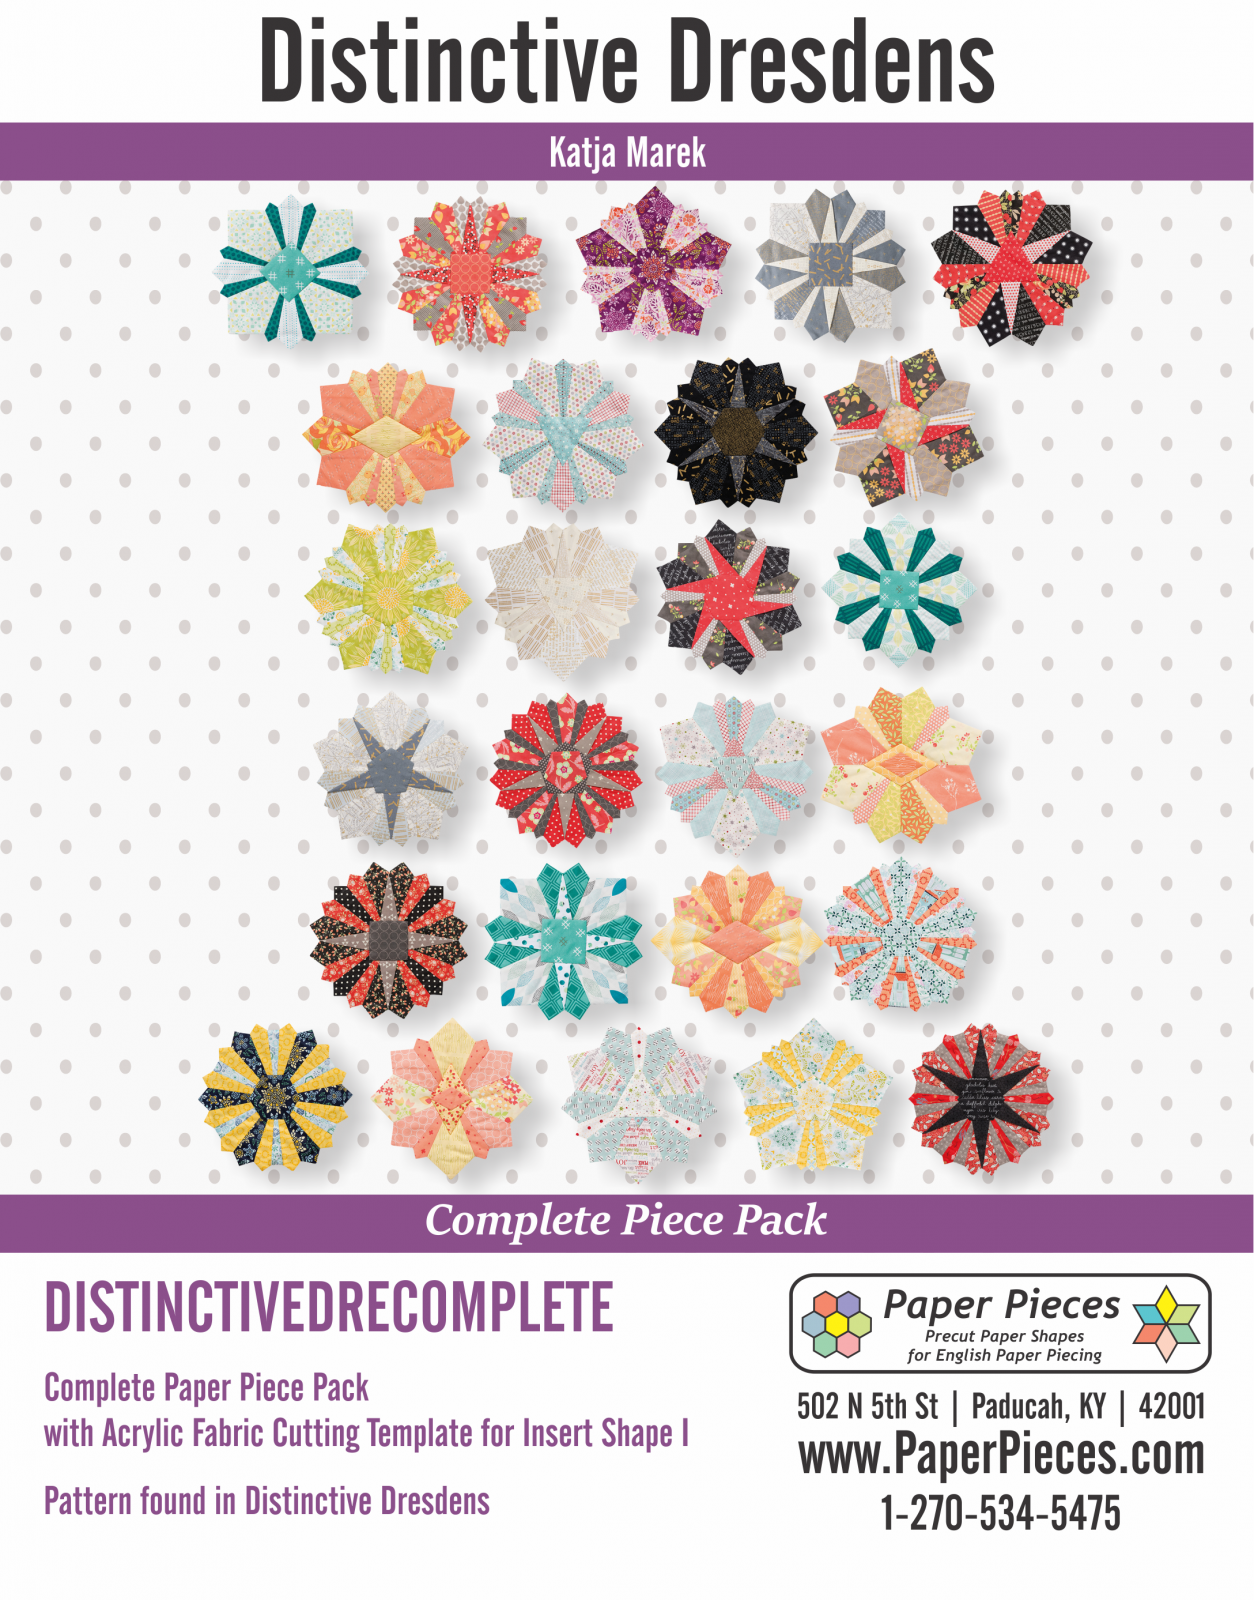 Distinctive Dresdens Complete Piece Pack